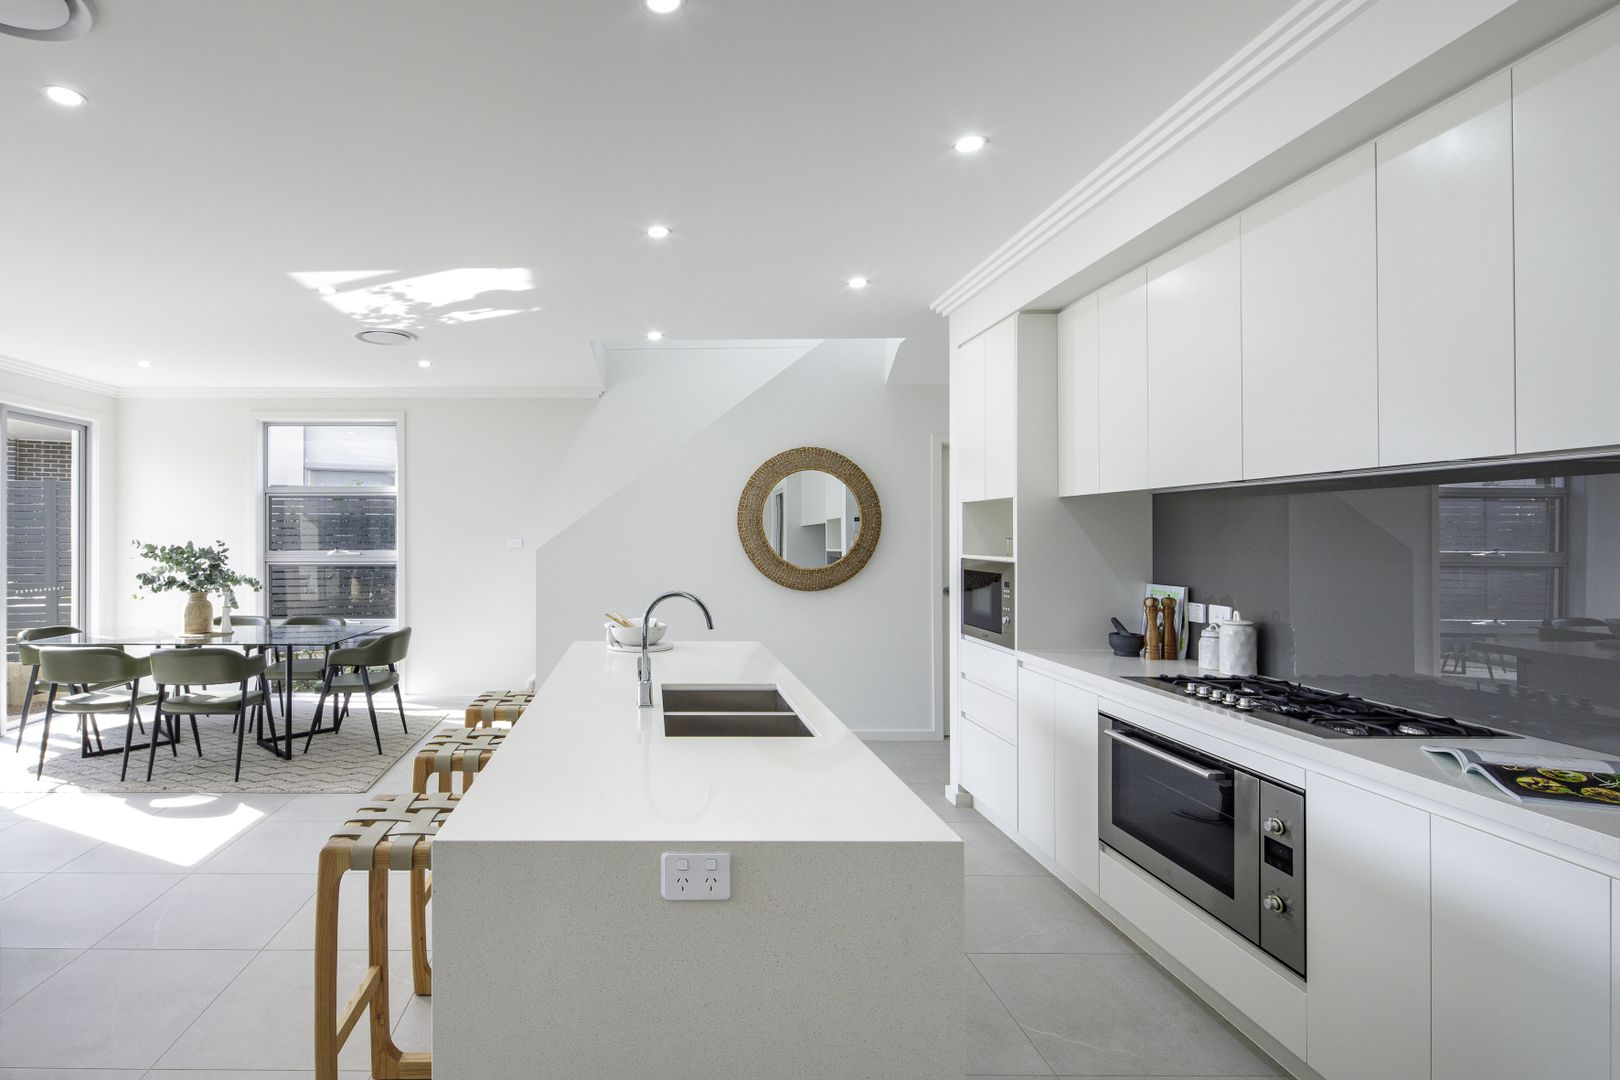 Lot 53/107 Bradley Street, Glenmore Park NSW 2745, Image 0